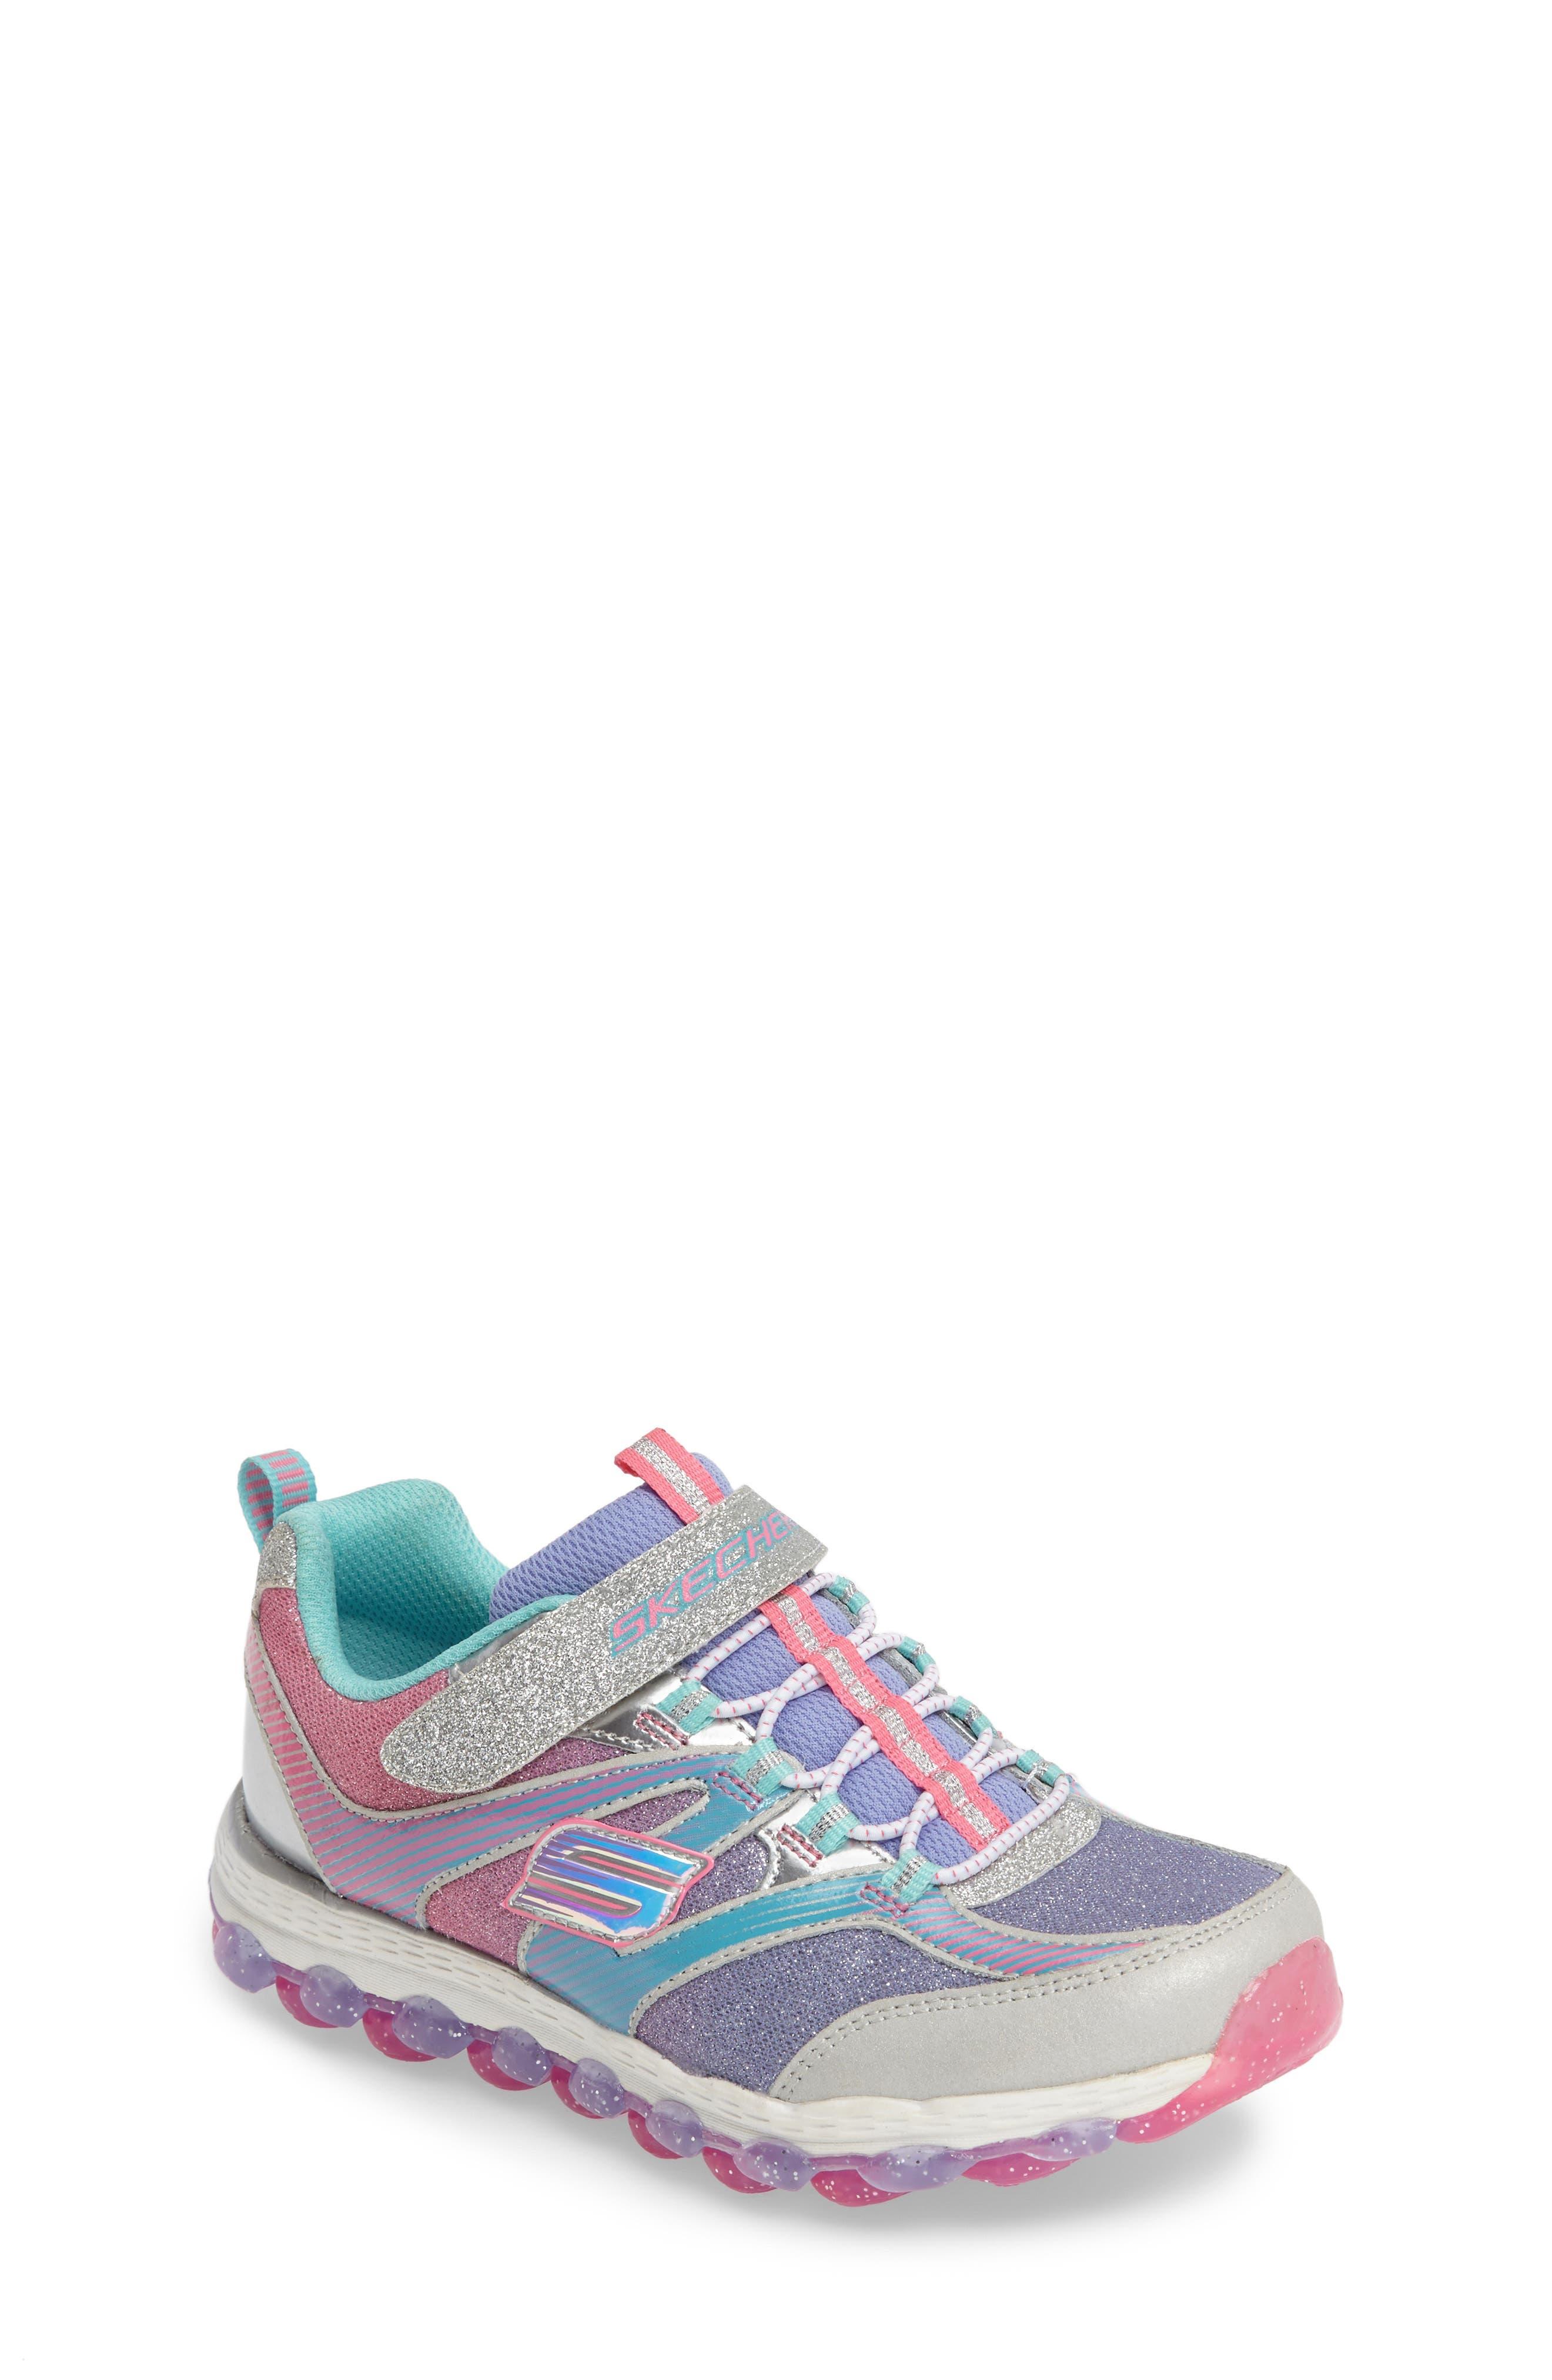 SKECHERS Skech-Air Ultra Glam It Up Sneaker (Toddler, Little Kid & Big Kid)